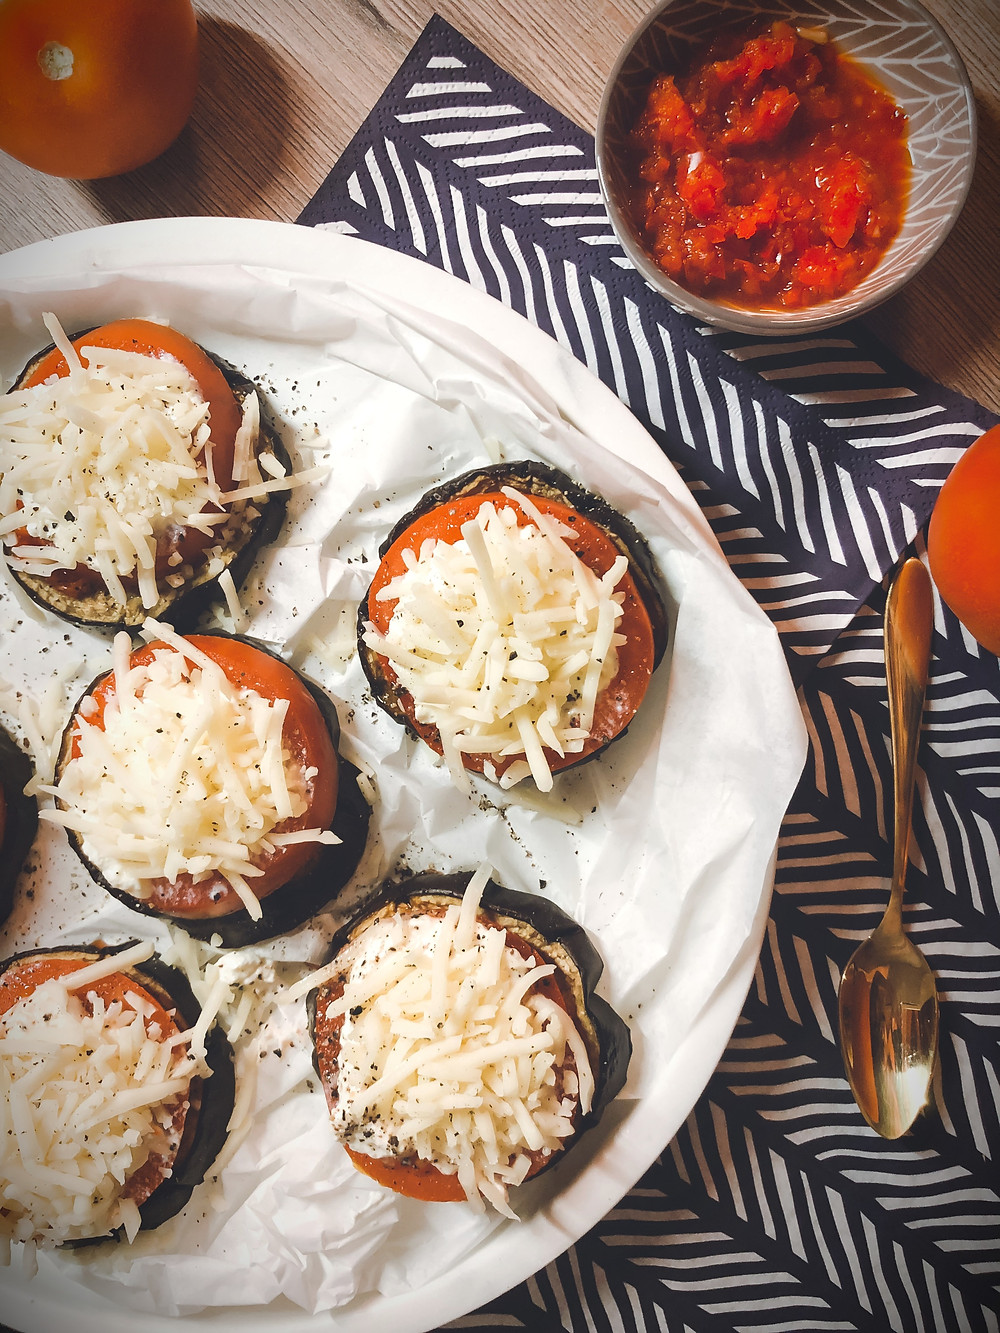 focusflowfood focus flow food low carb rezept mit auberginen gesunde pizza mozzarella tomaten